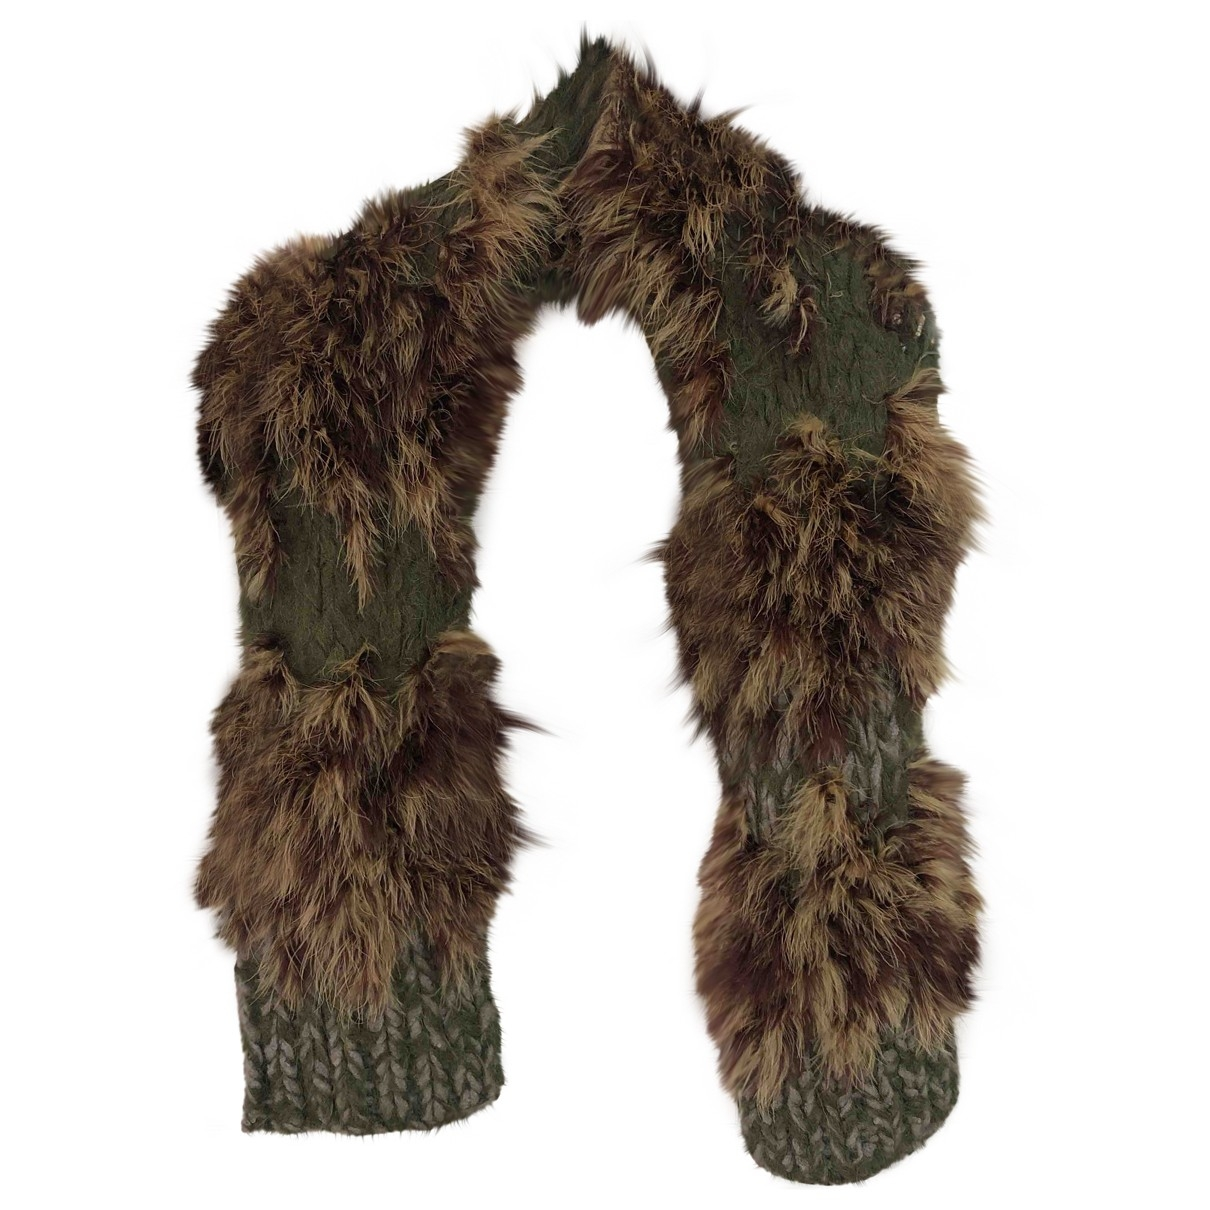 Dries Van Noten - Foulard   pour femme en laine - vert